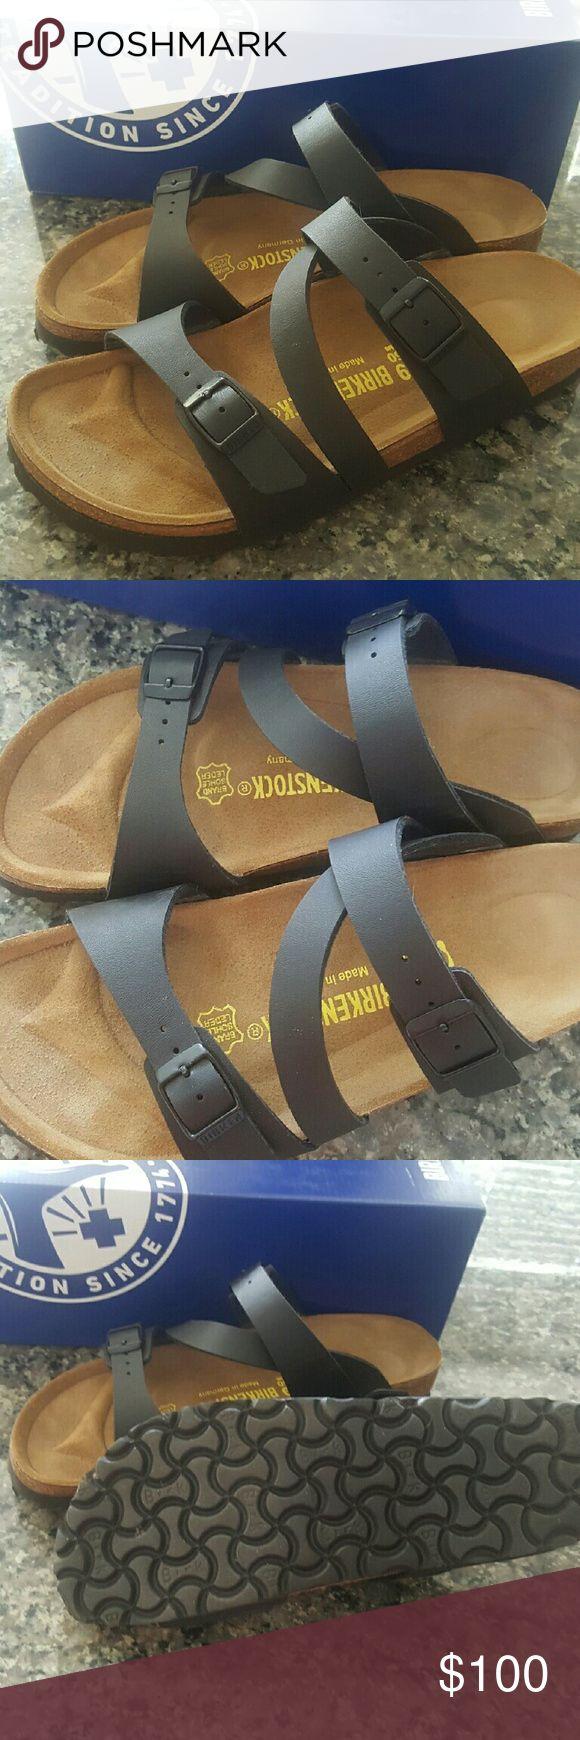 Birkenstocks- Salina Birkenstocks- Salina. Brand new in box! Birkenstock Shoes